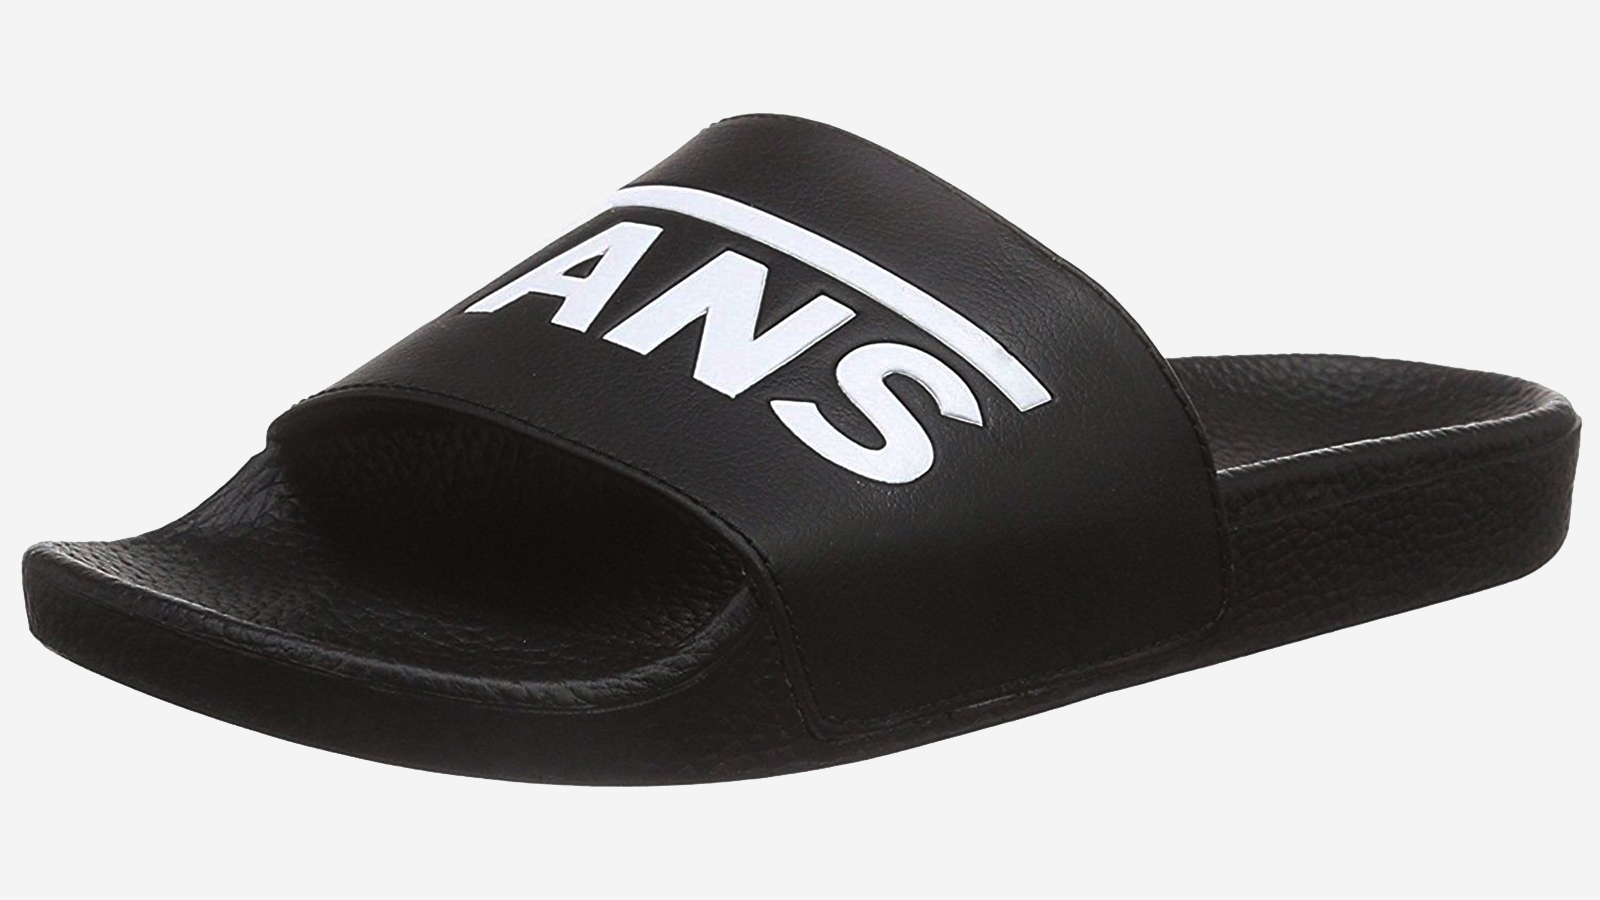 Vans Men's Slides